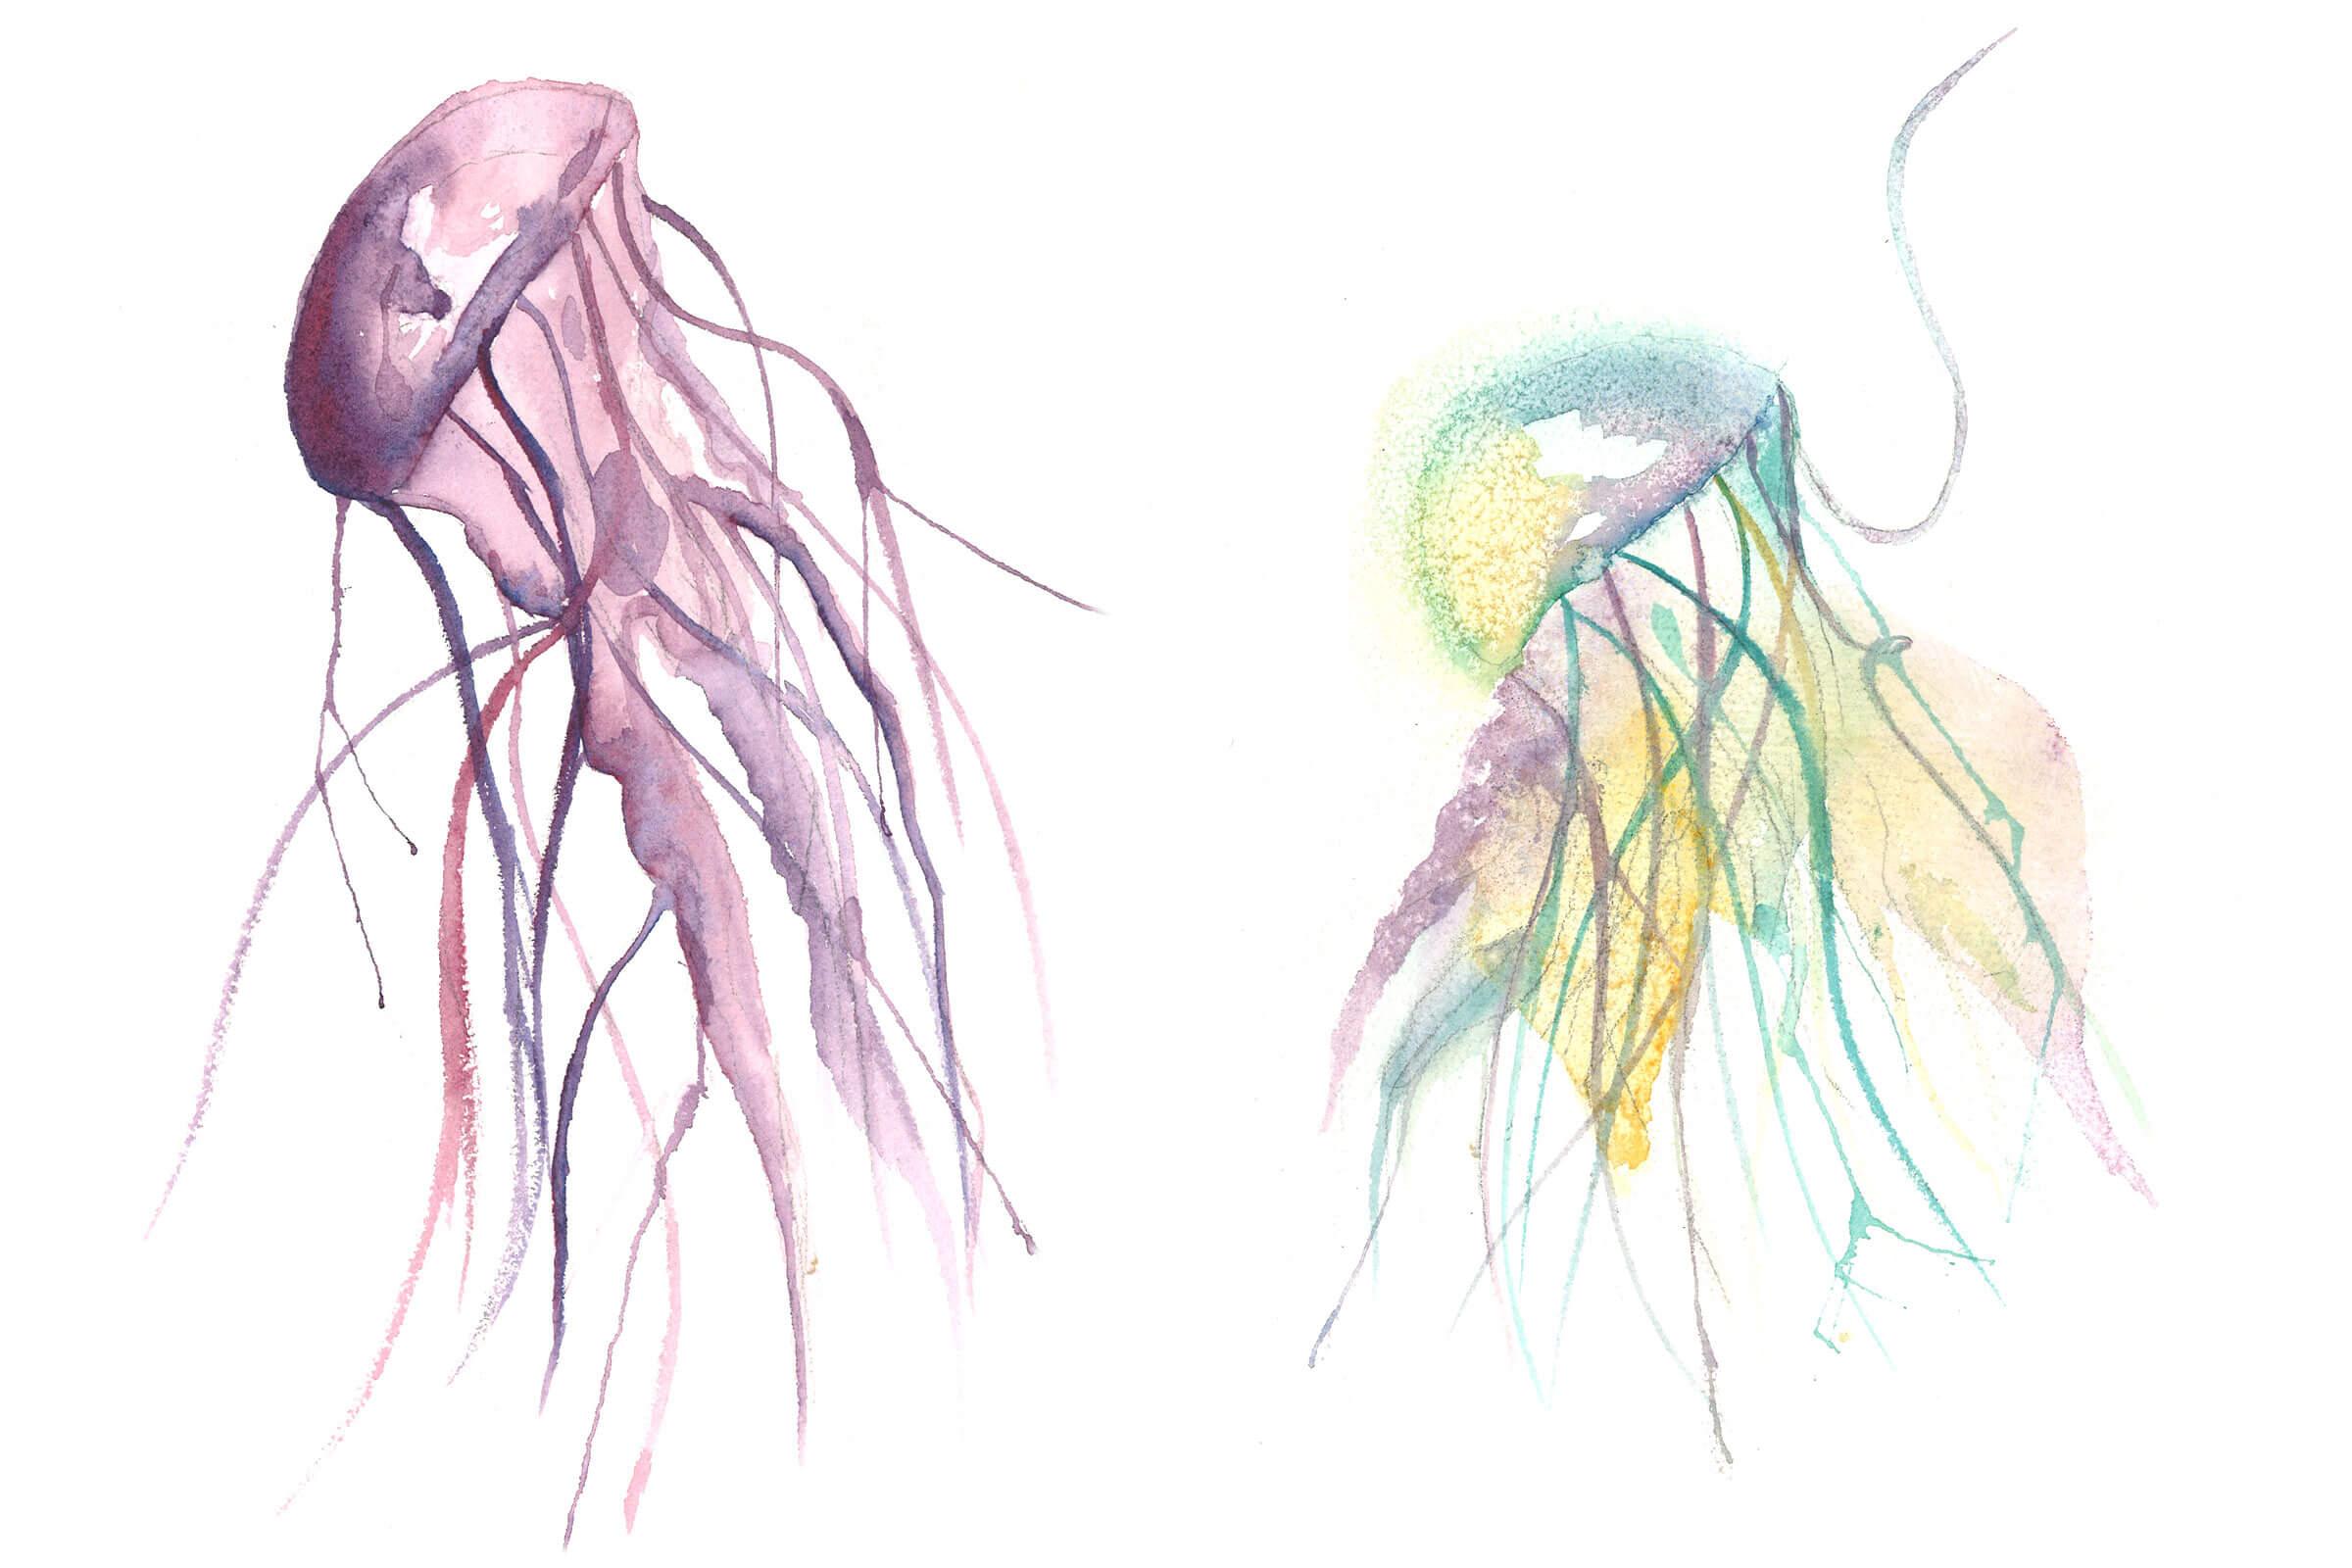 Watercolors_2400x1600